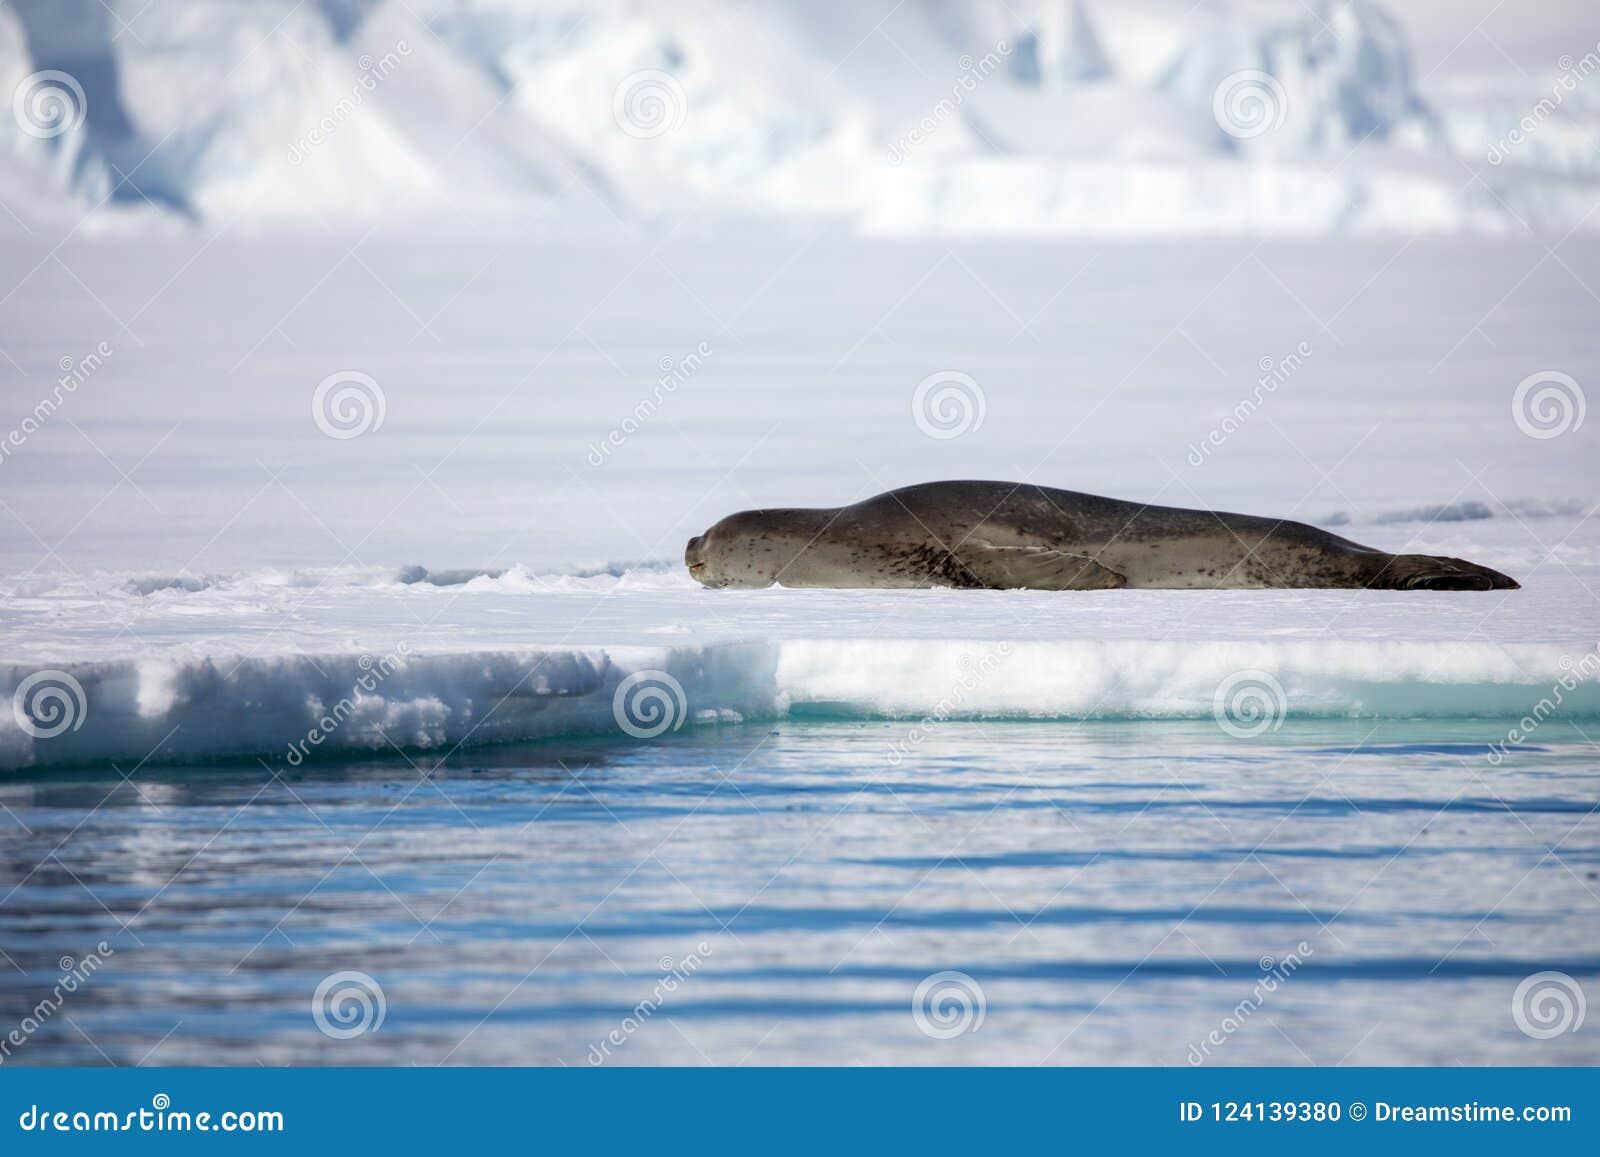 Leopard seal sitting on a iceberg